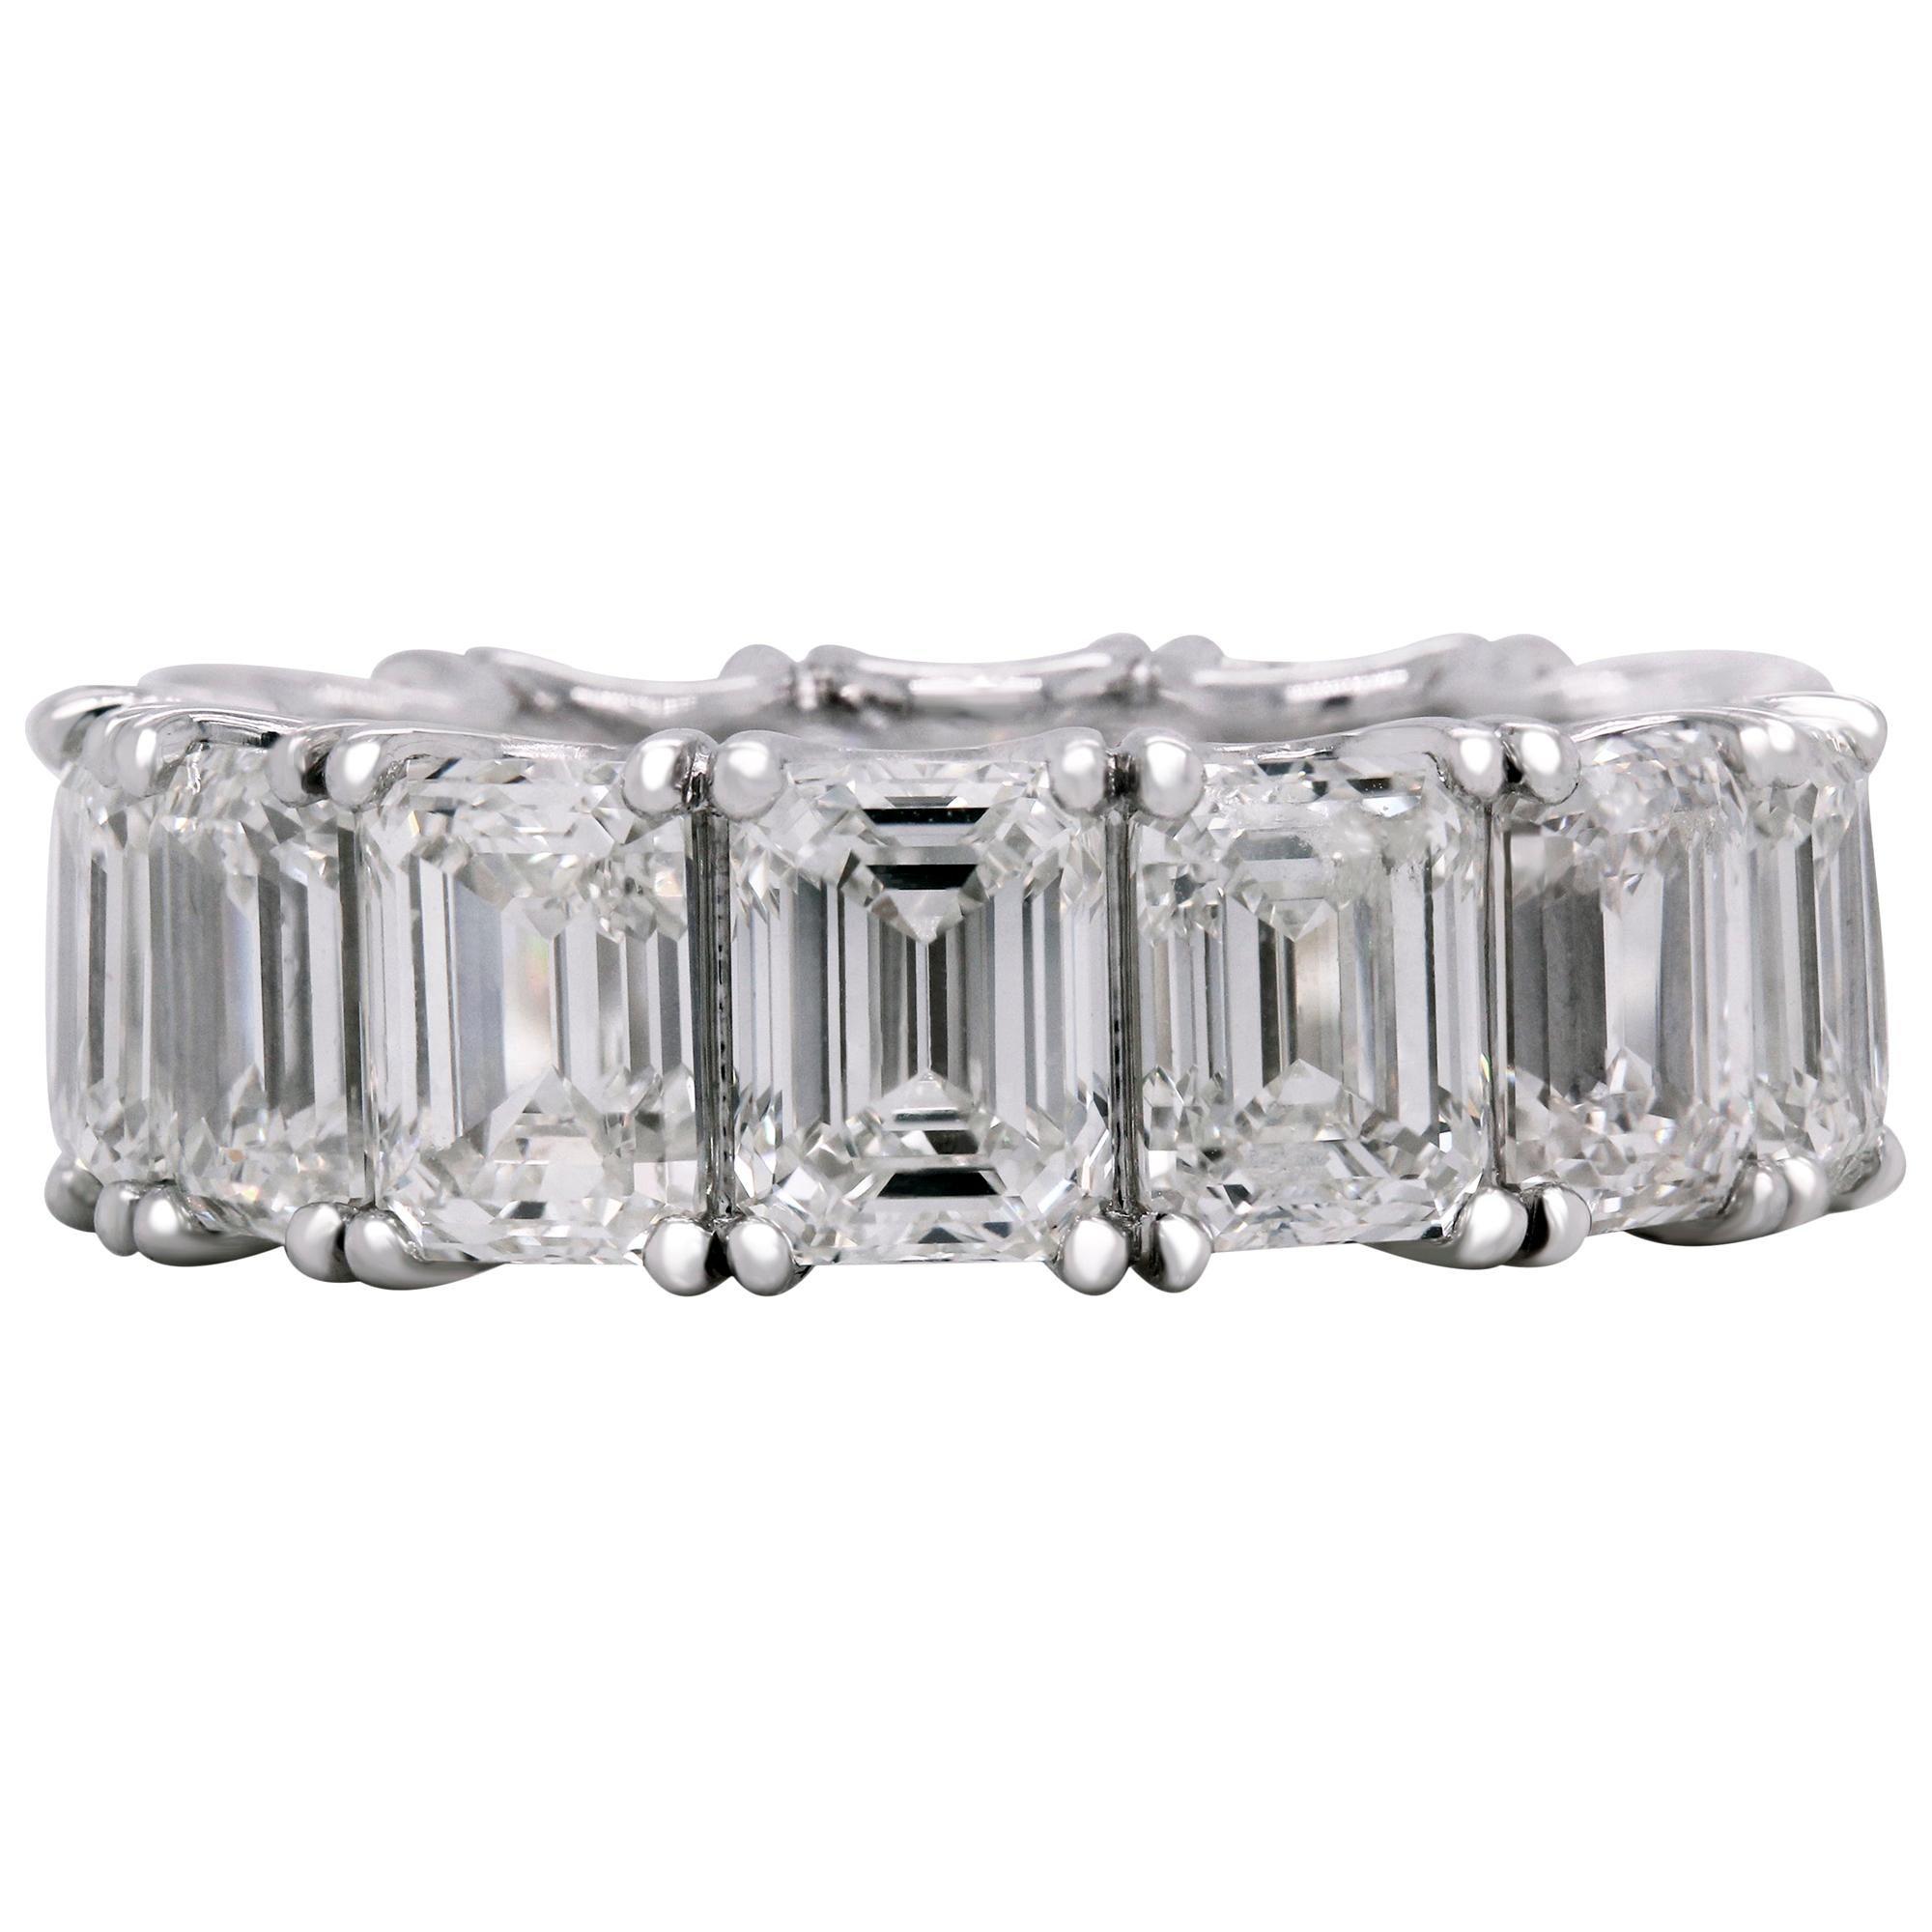 14.19 Carat Emerald Cut Diamonds All GIA Certified Platinum Eternity Band